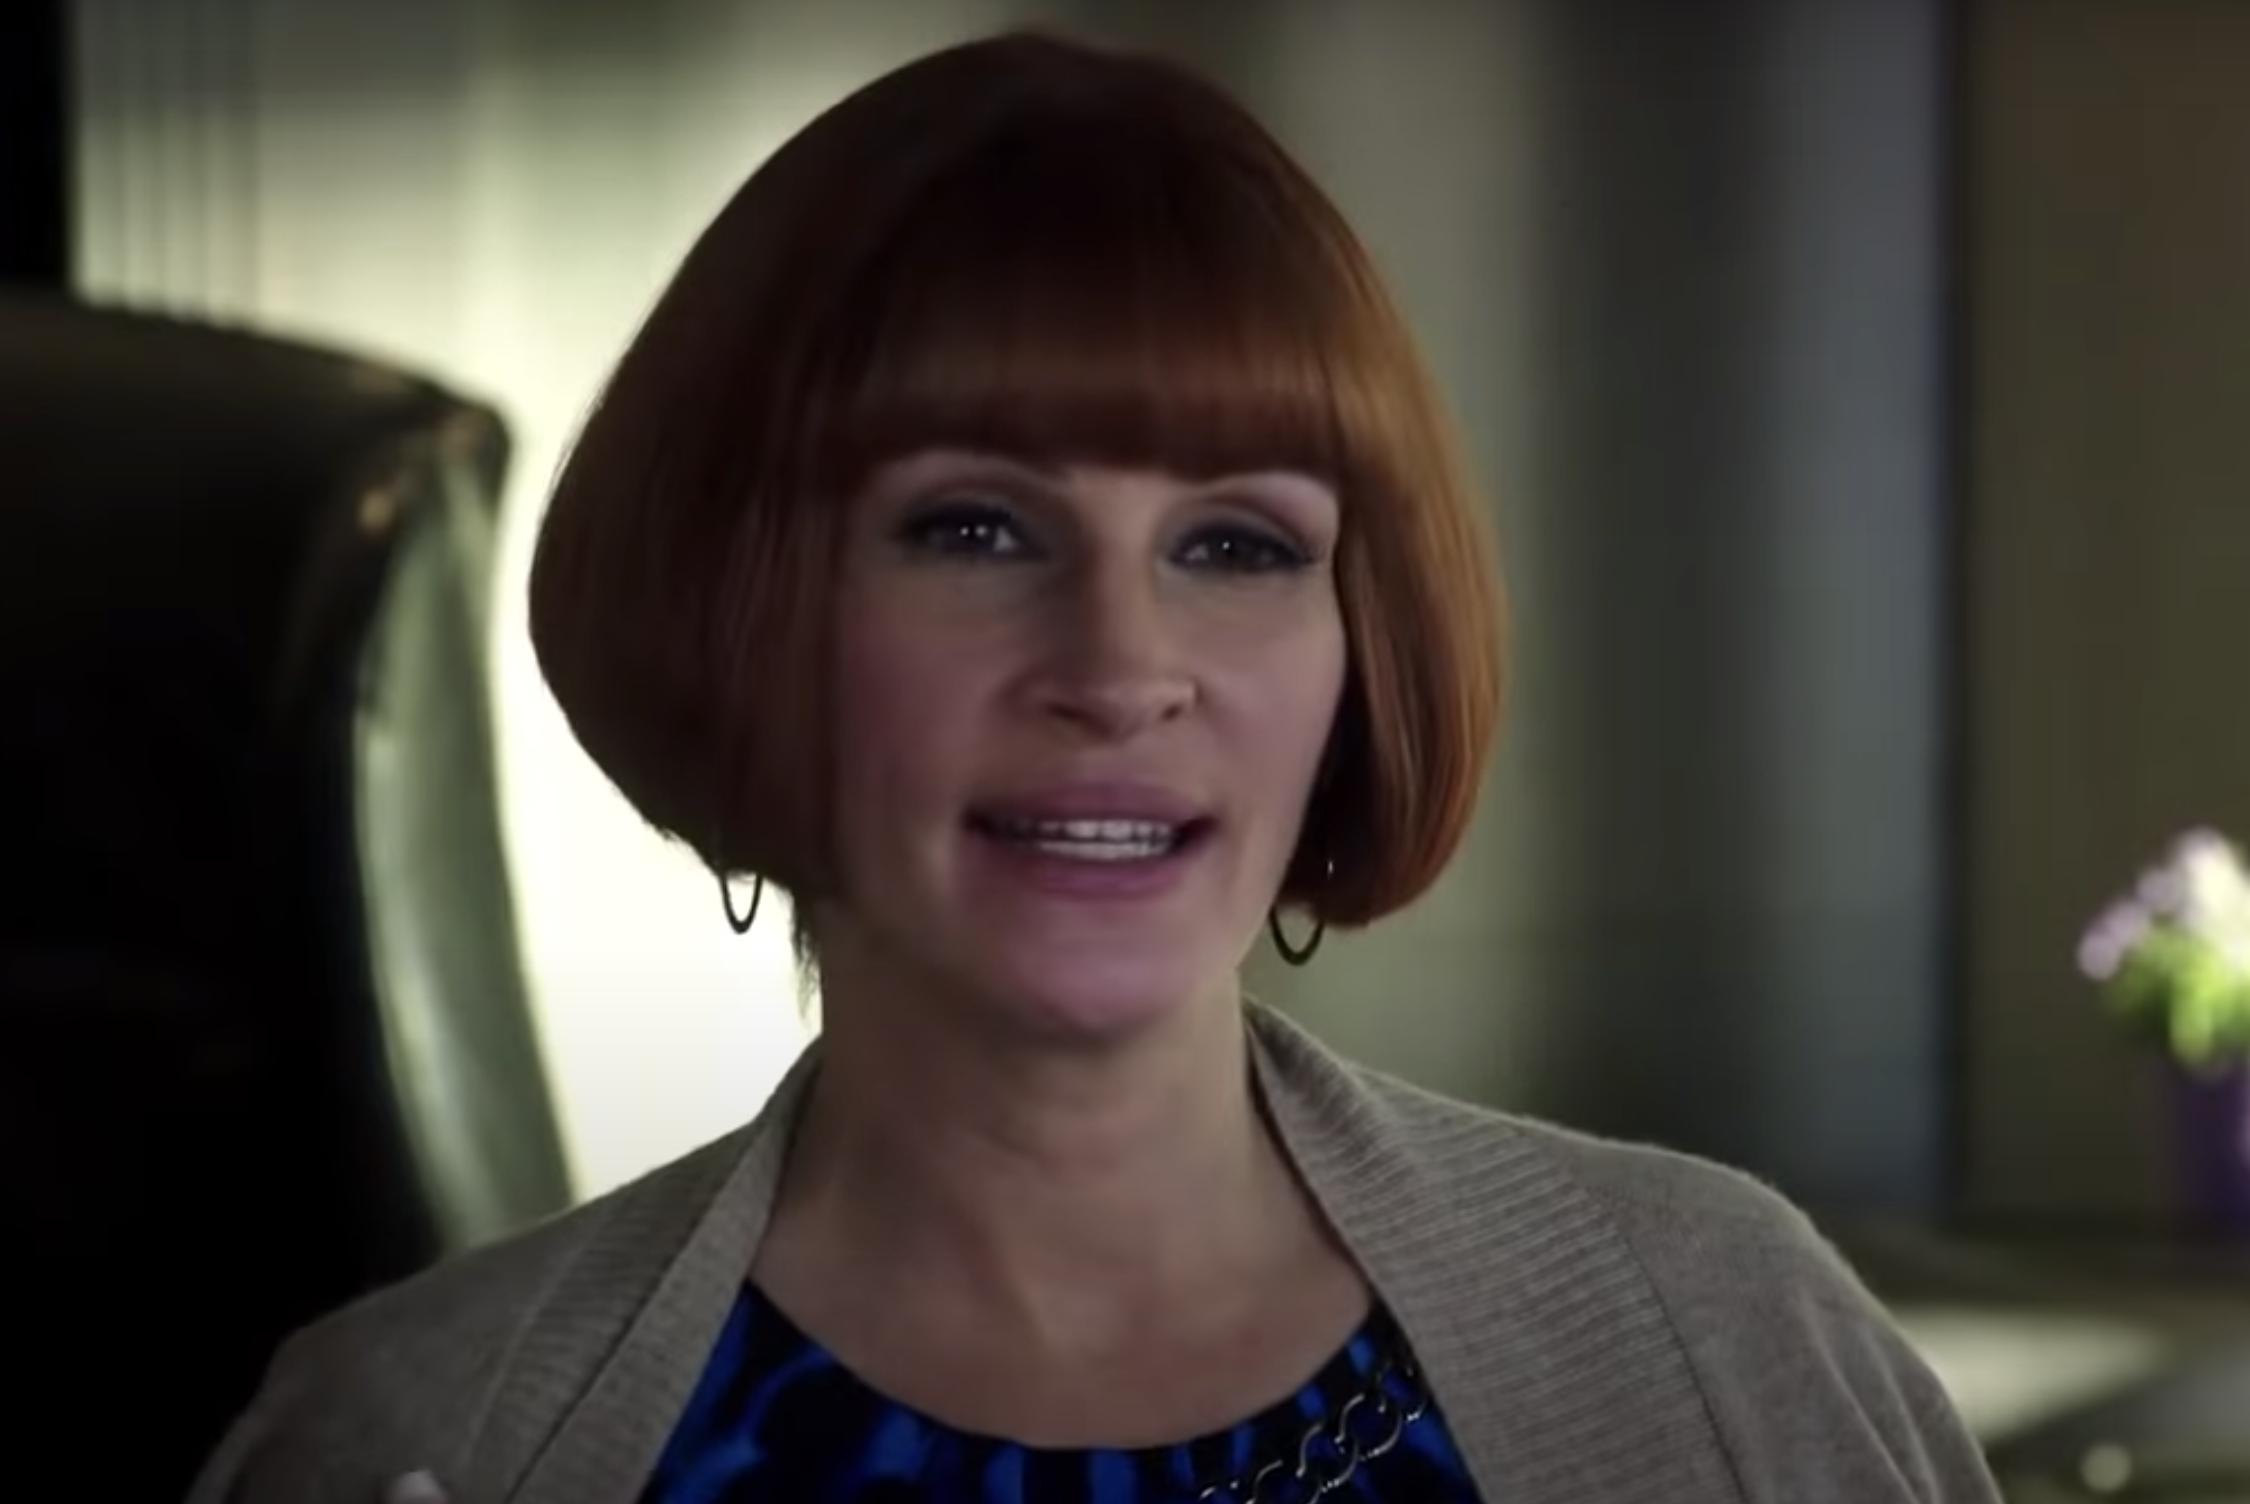 Julia Roberts with a bowl cut wig